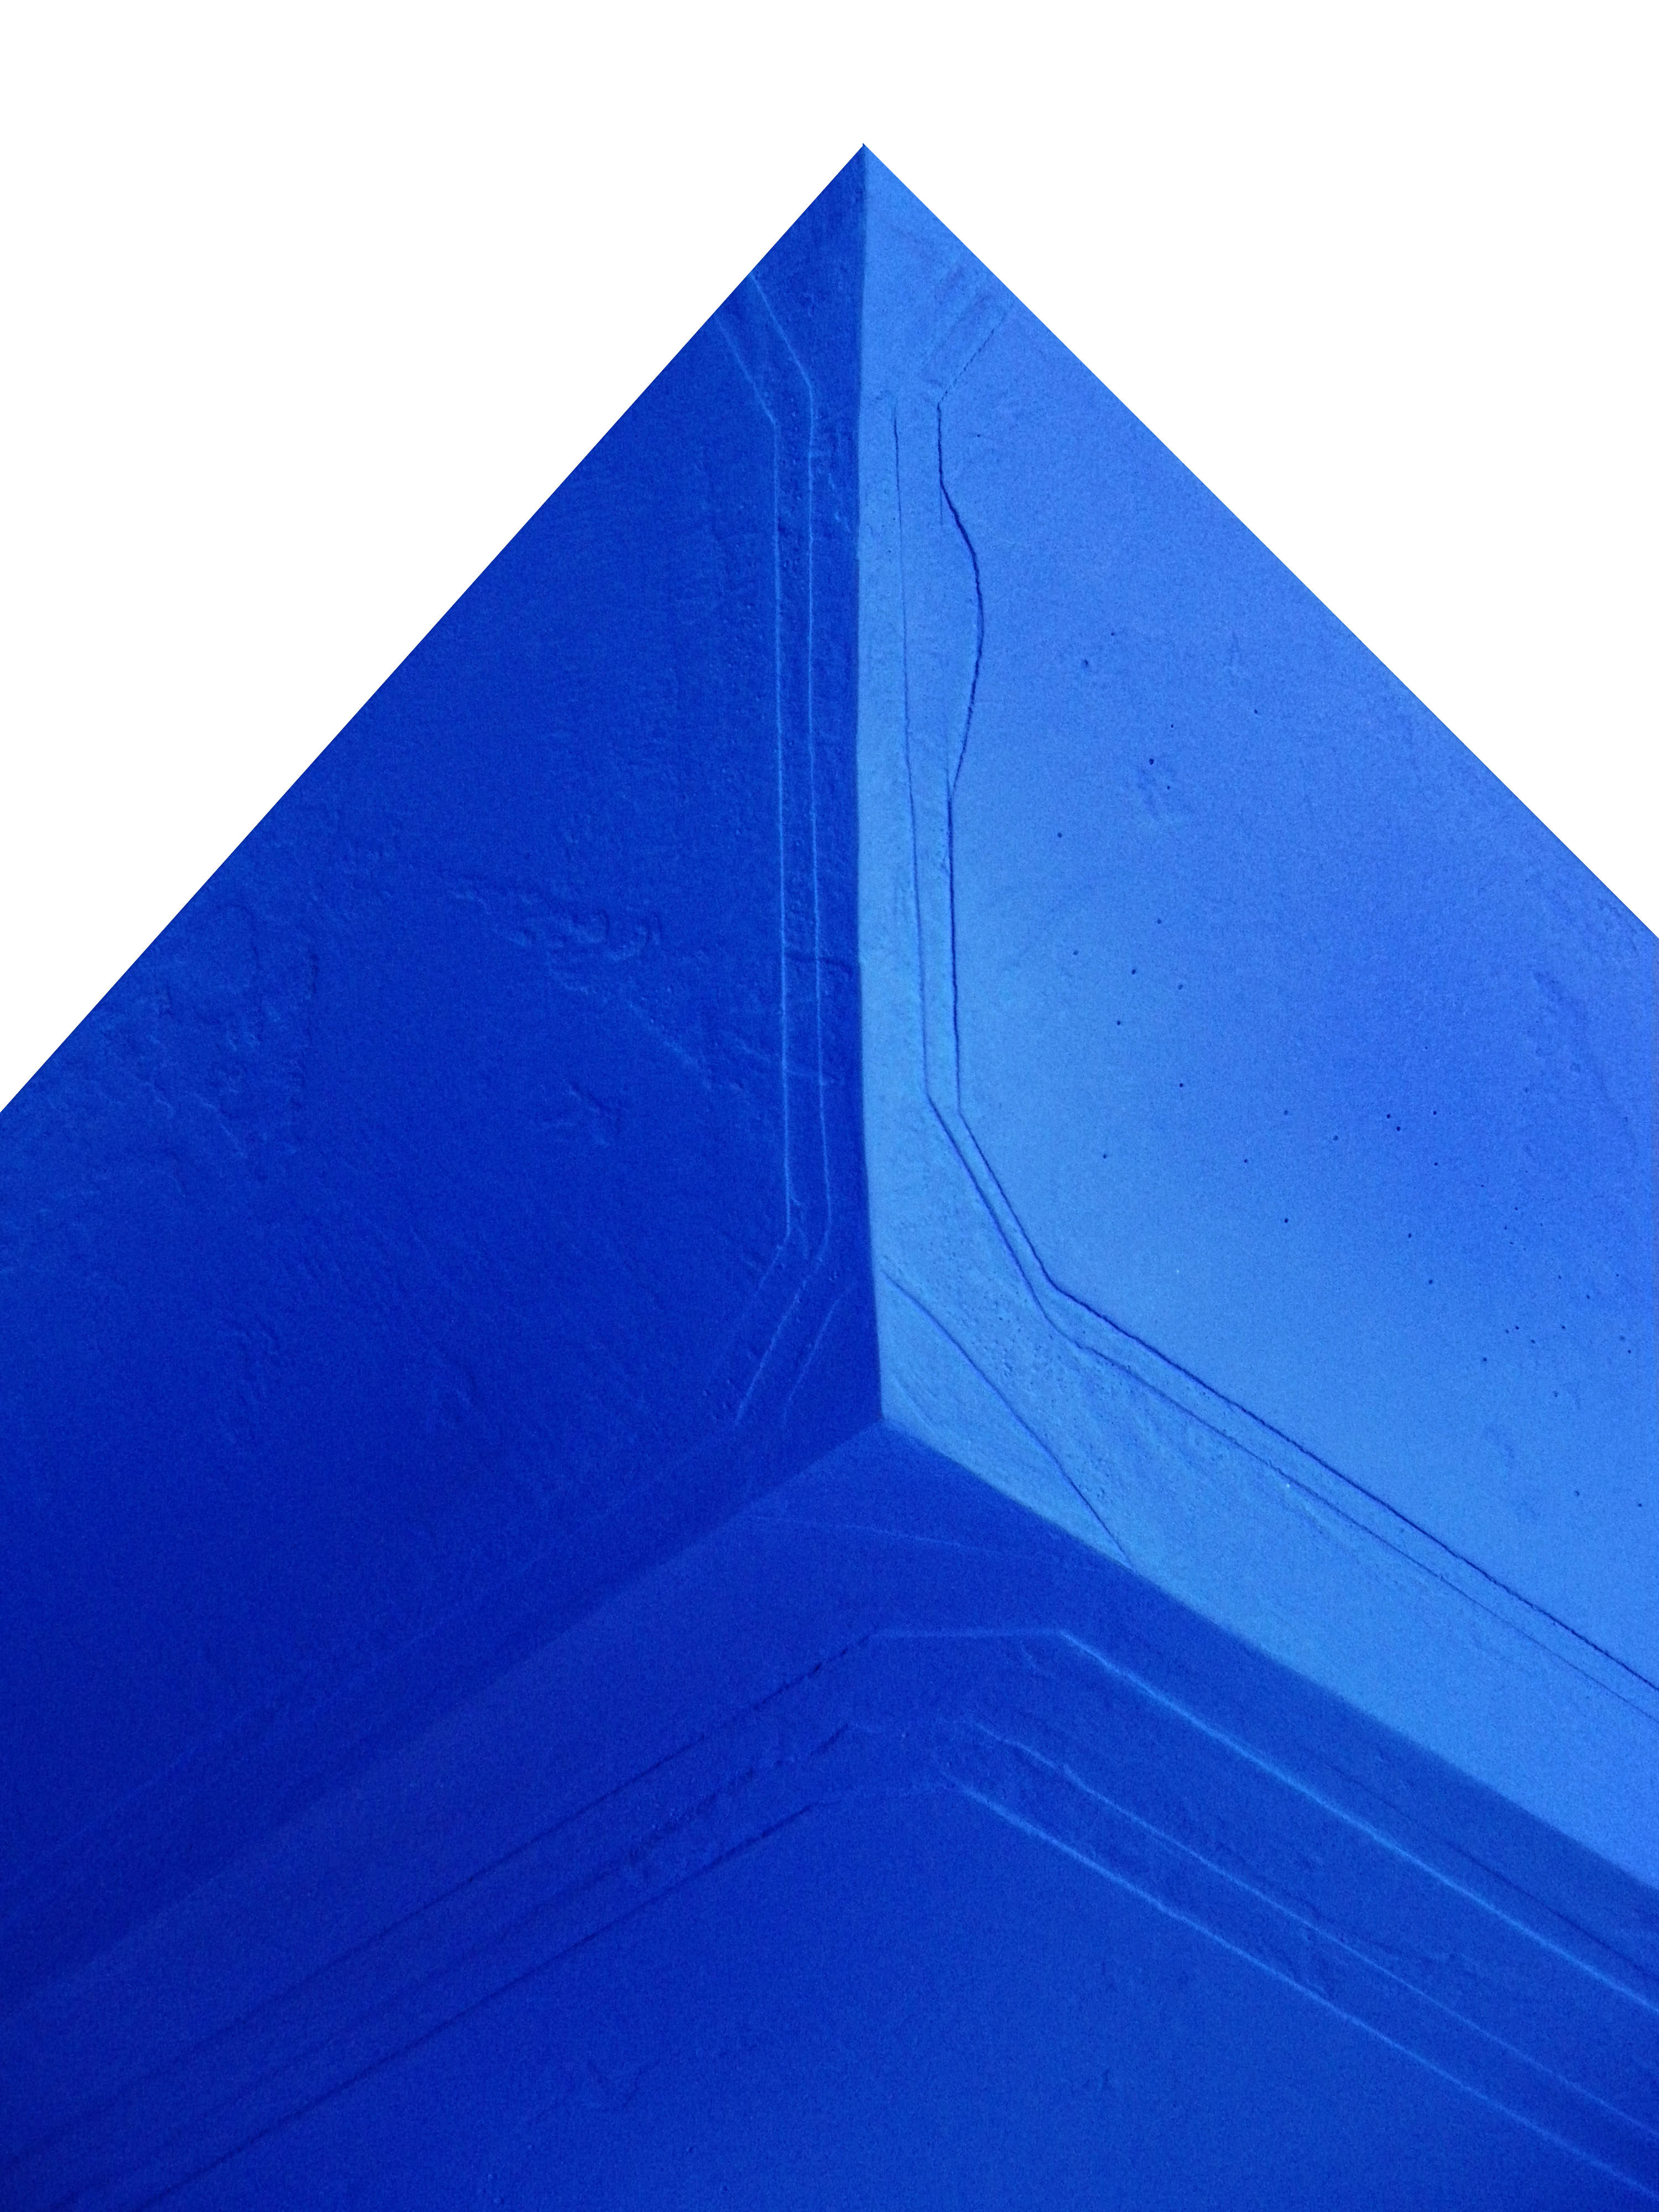 Detalle De Polyhedron